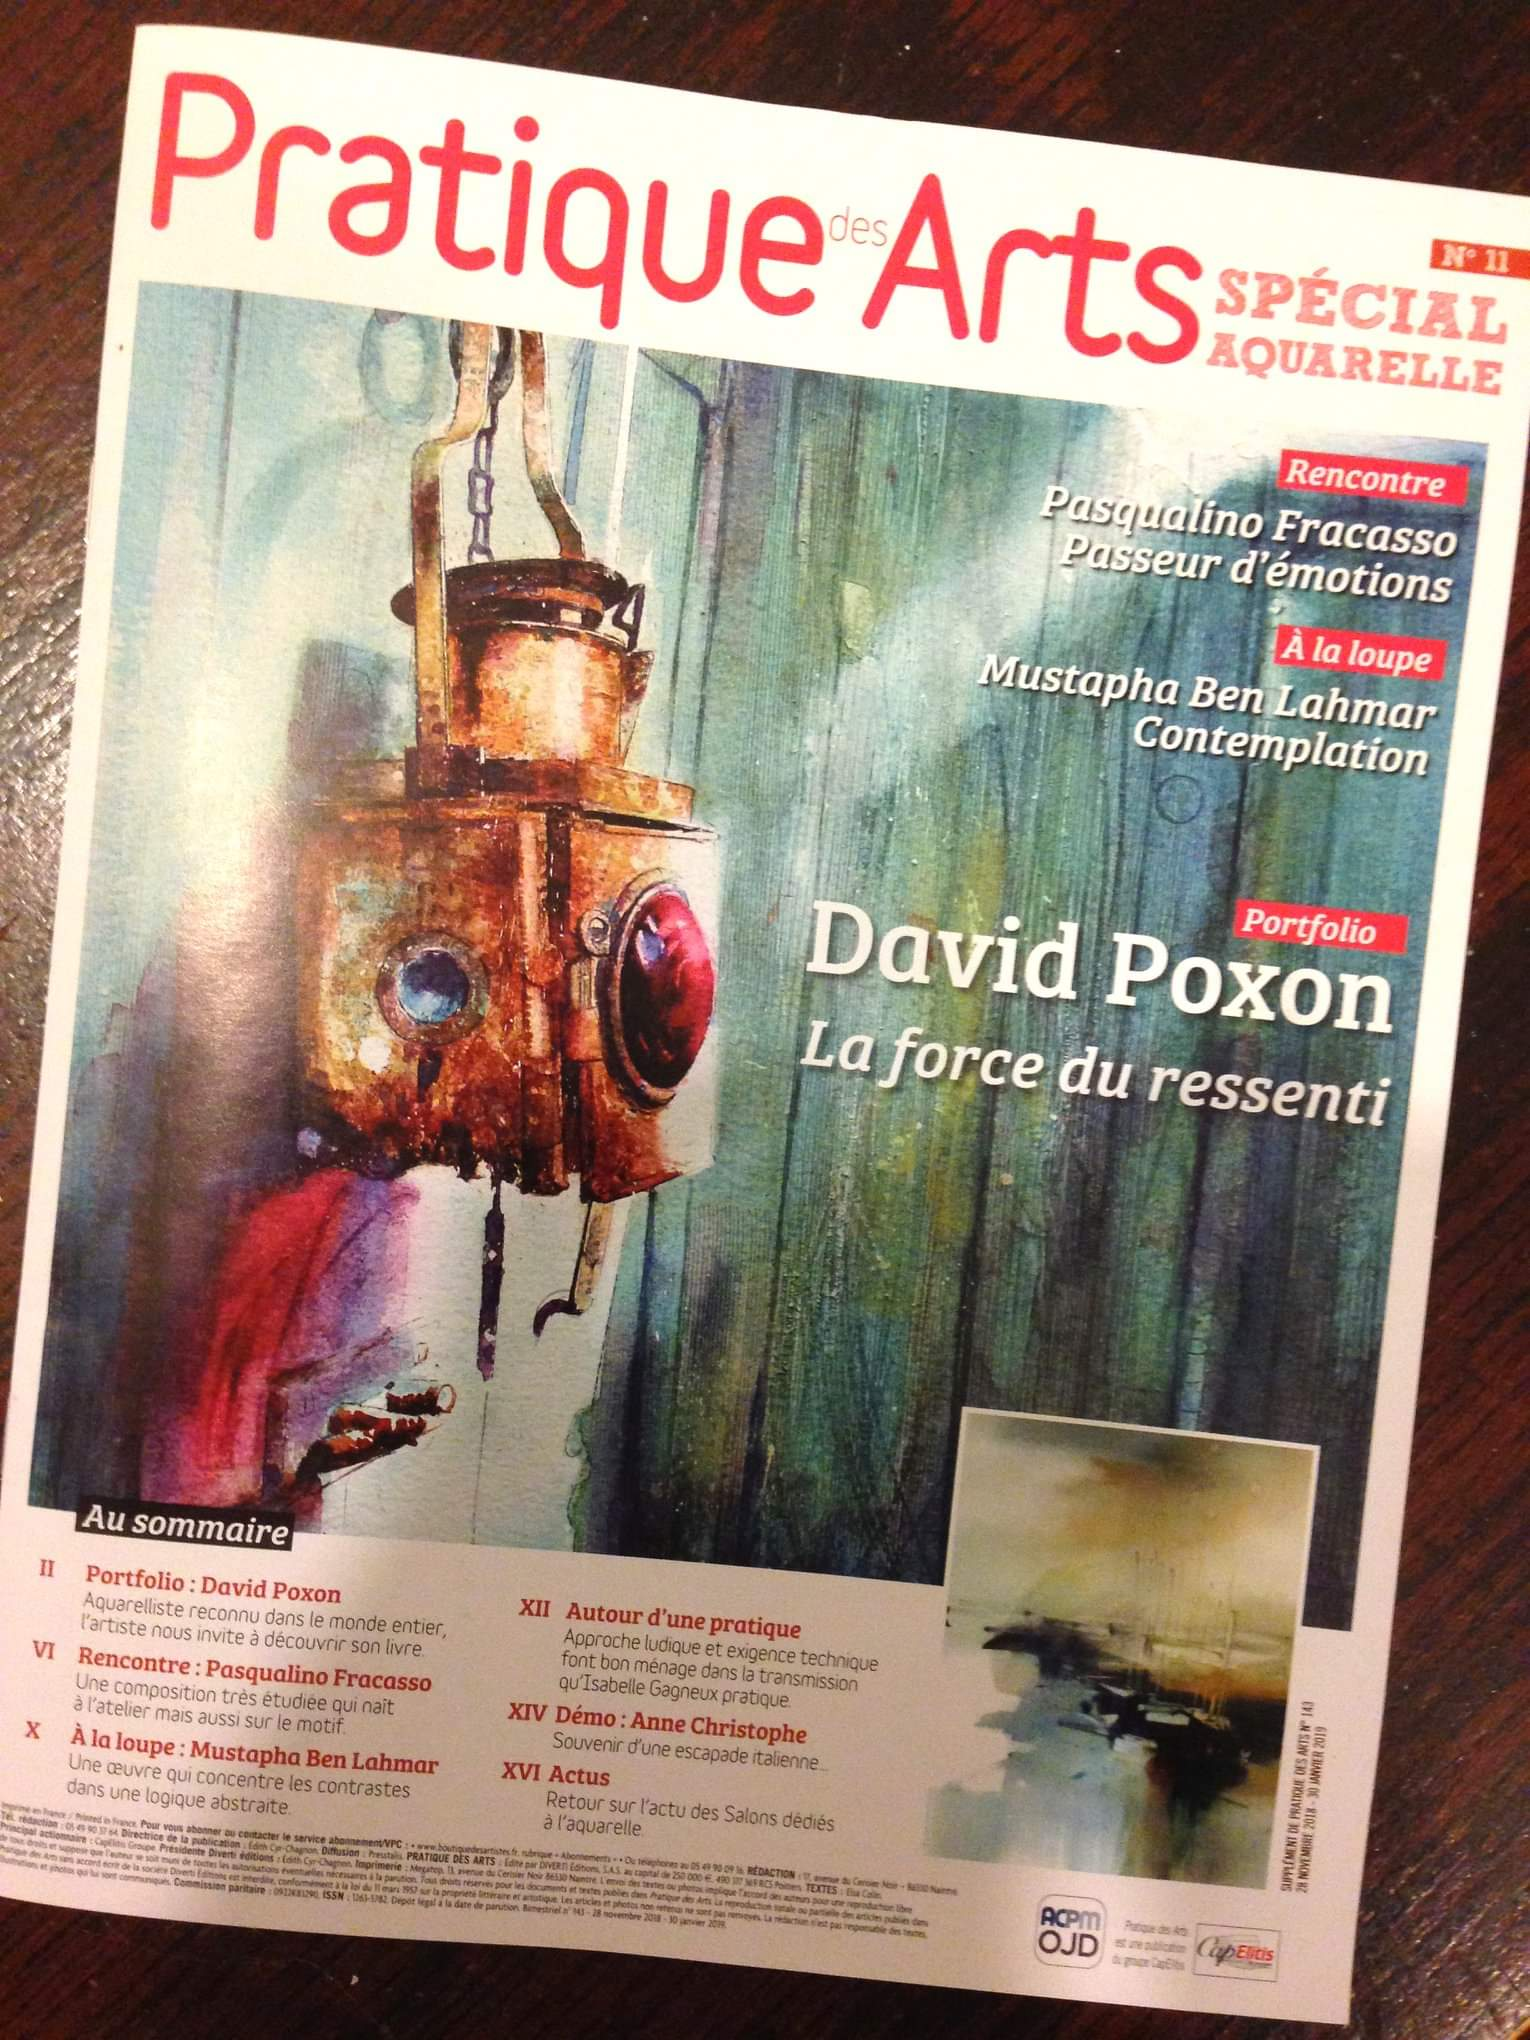 David Poxon on Praqtique Arts France Front Cover